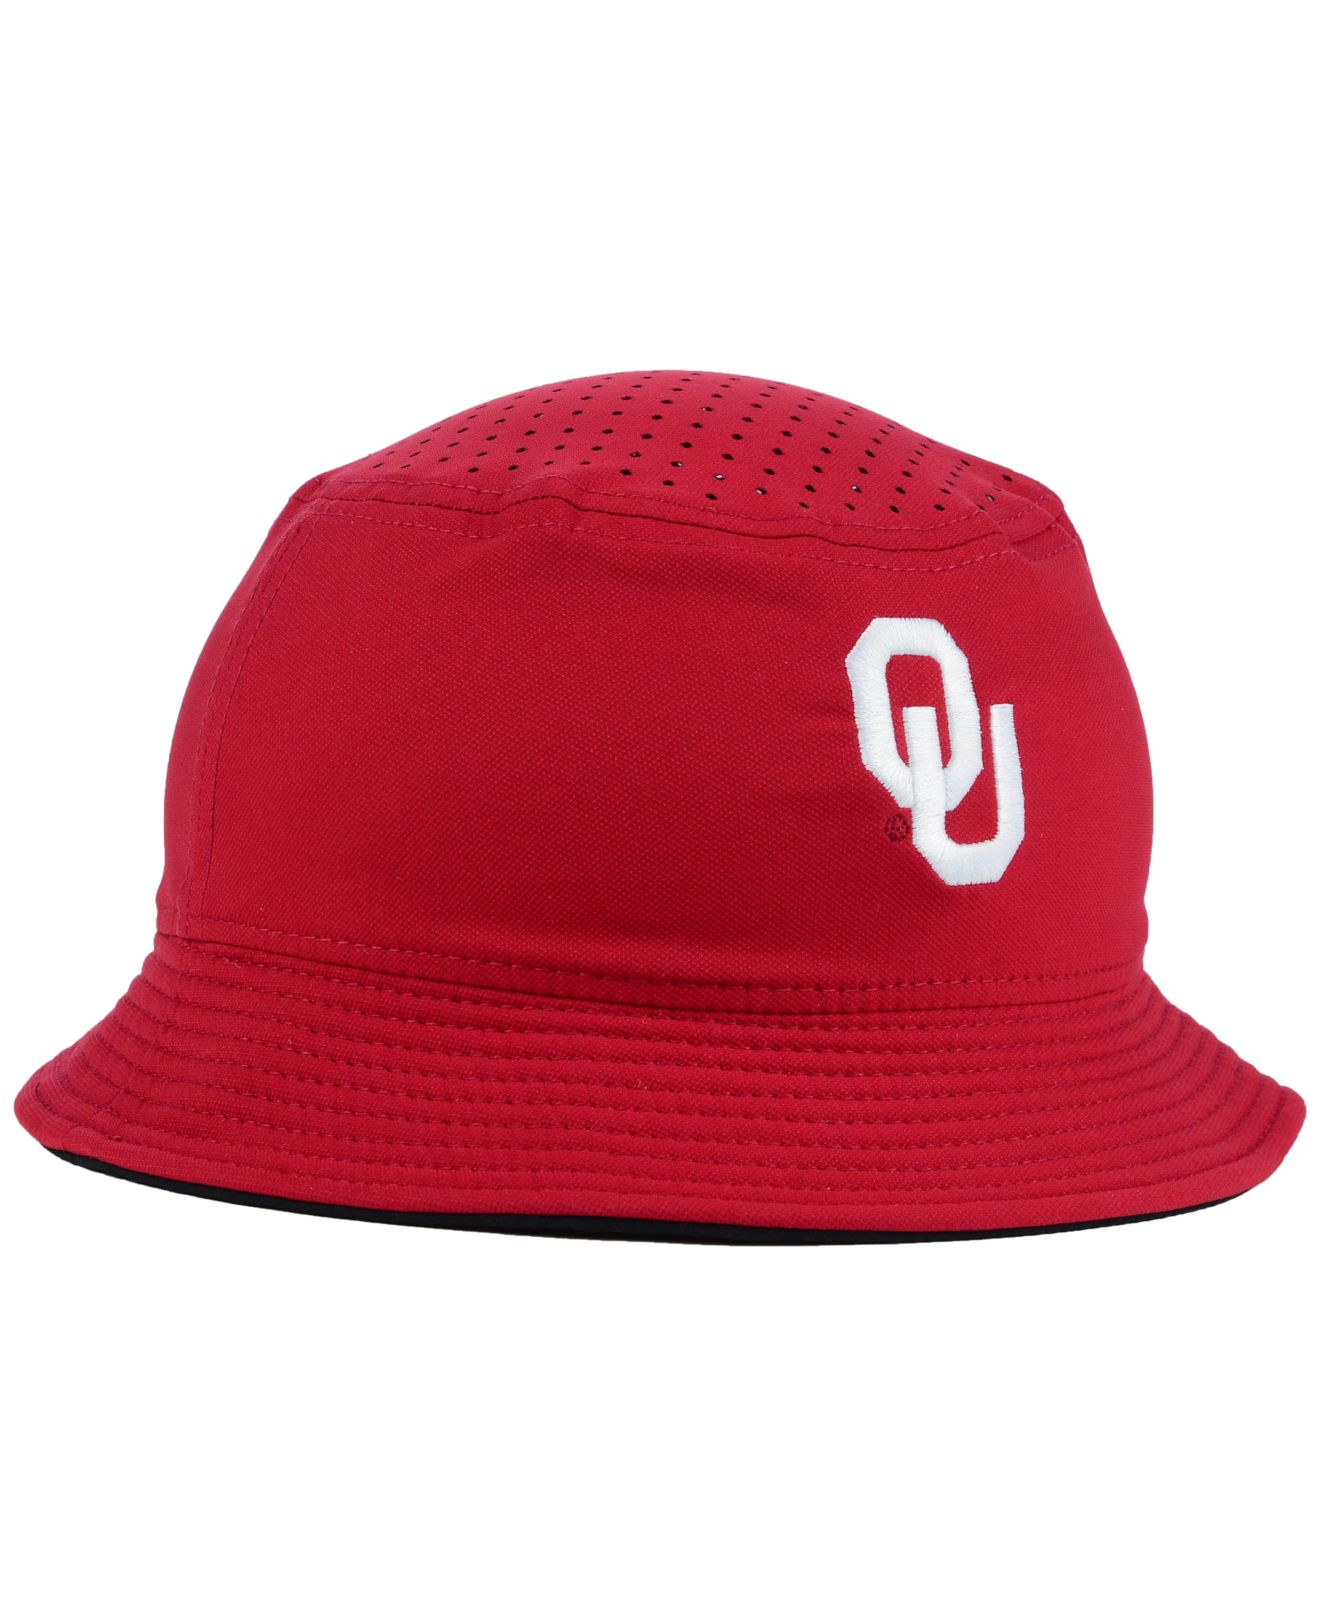 detailed look 37b15 fbde1 ... cheapest lyst nike oklahoma sooners vapor bucket hat in purple for men  7ce4e 7f08b